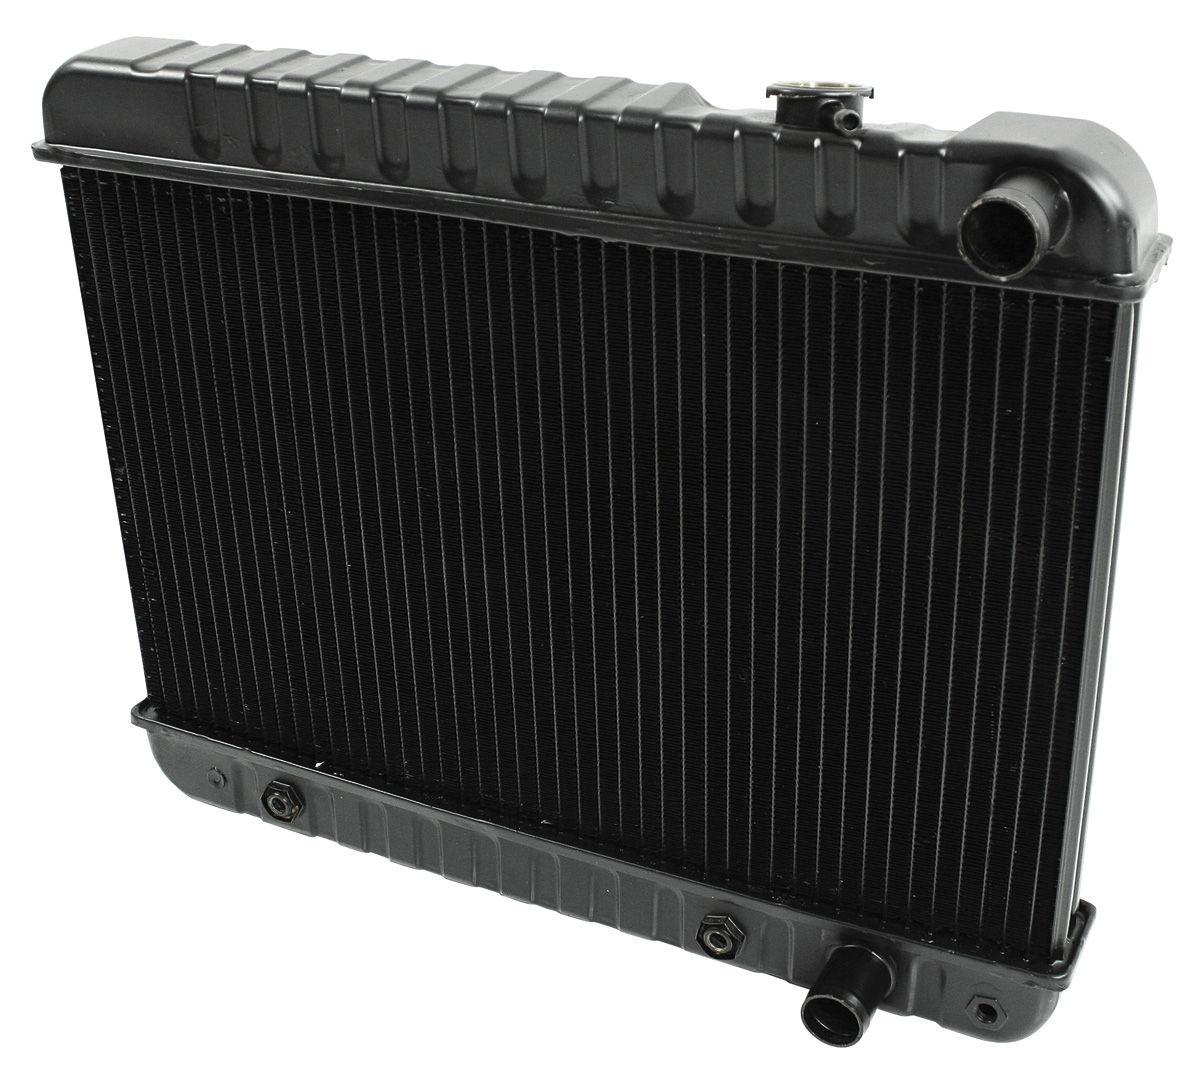 "Radiator, 1964 Skylark, 225 6-Cyl., Manual, 2-Row, 15-1/2"" X 18-5/8"" X 1-1/4"""